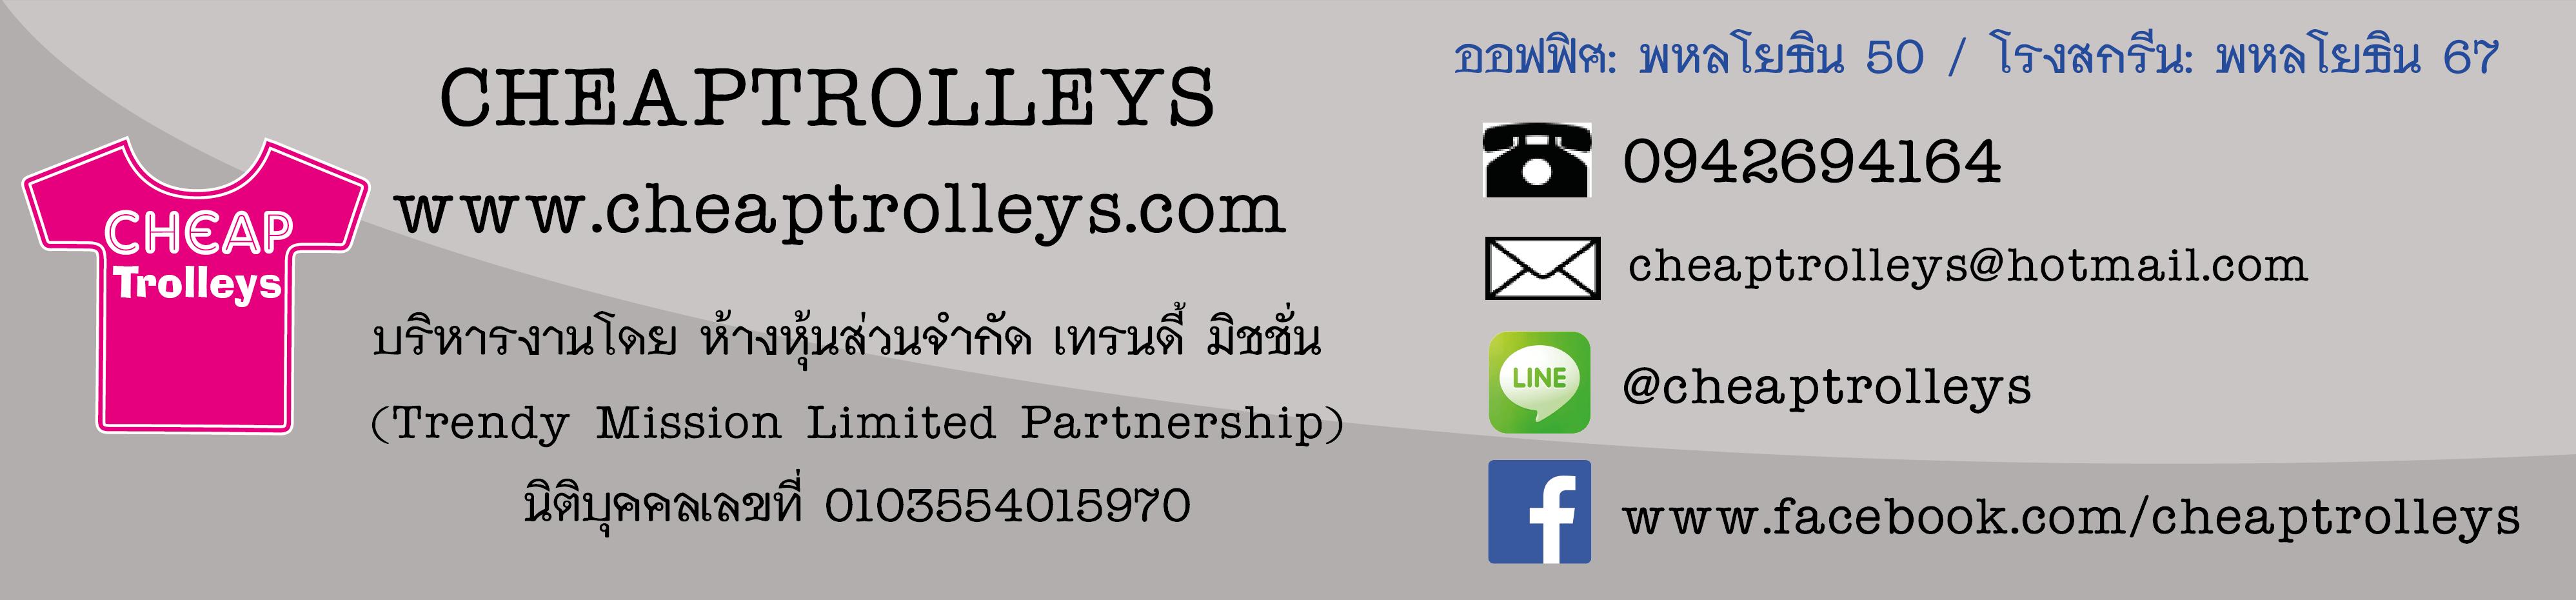 Cheaptrolleys Logo